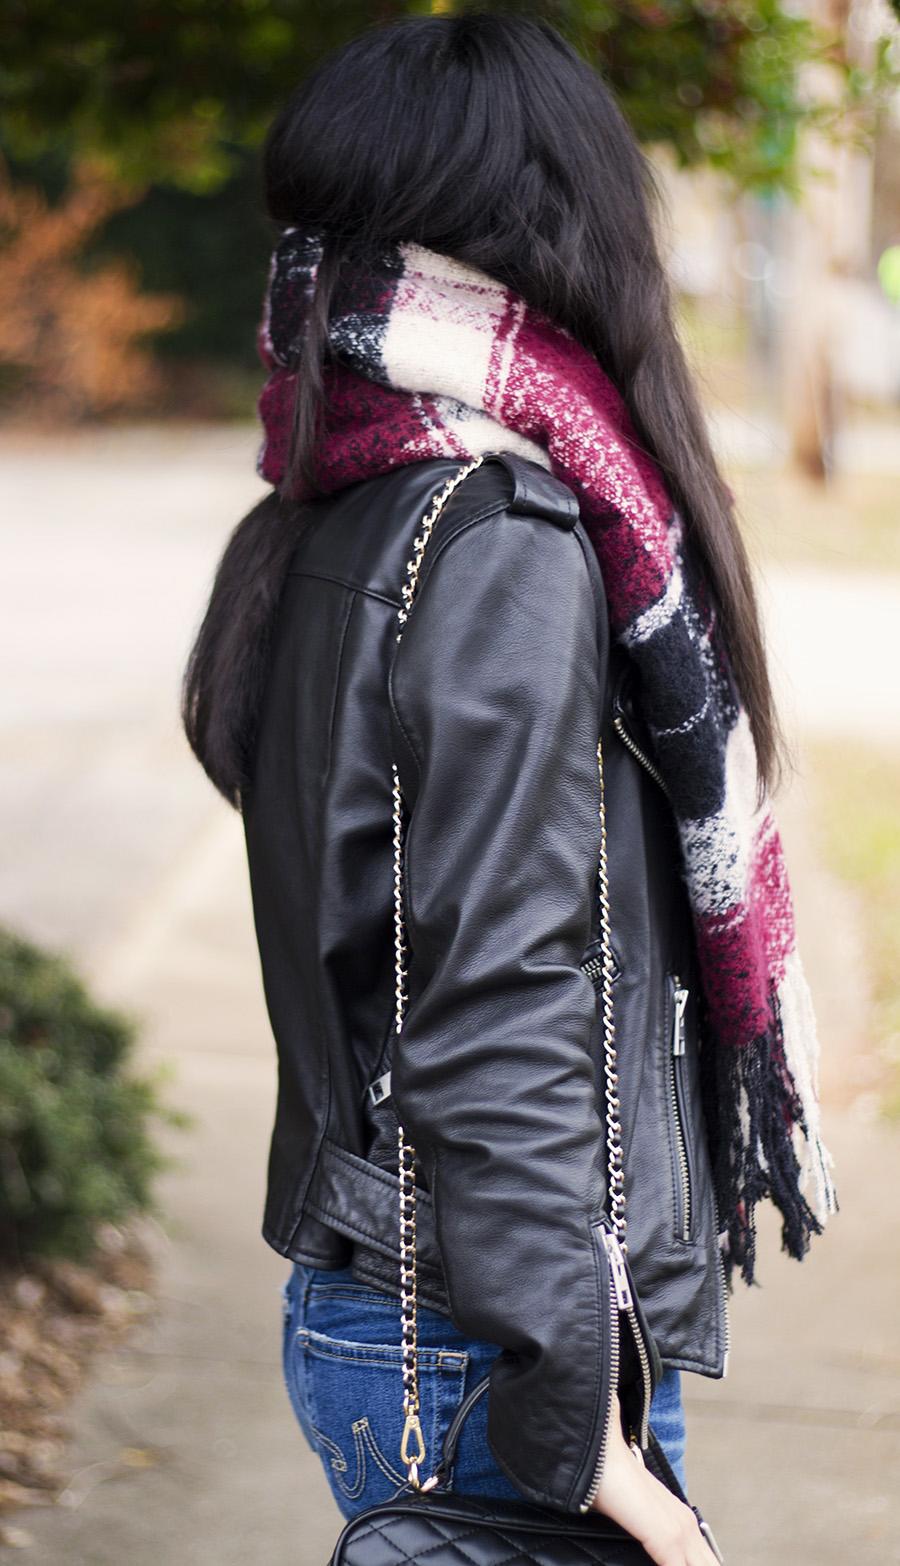 allsaints balfern biker jacket outfits